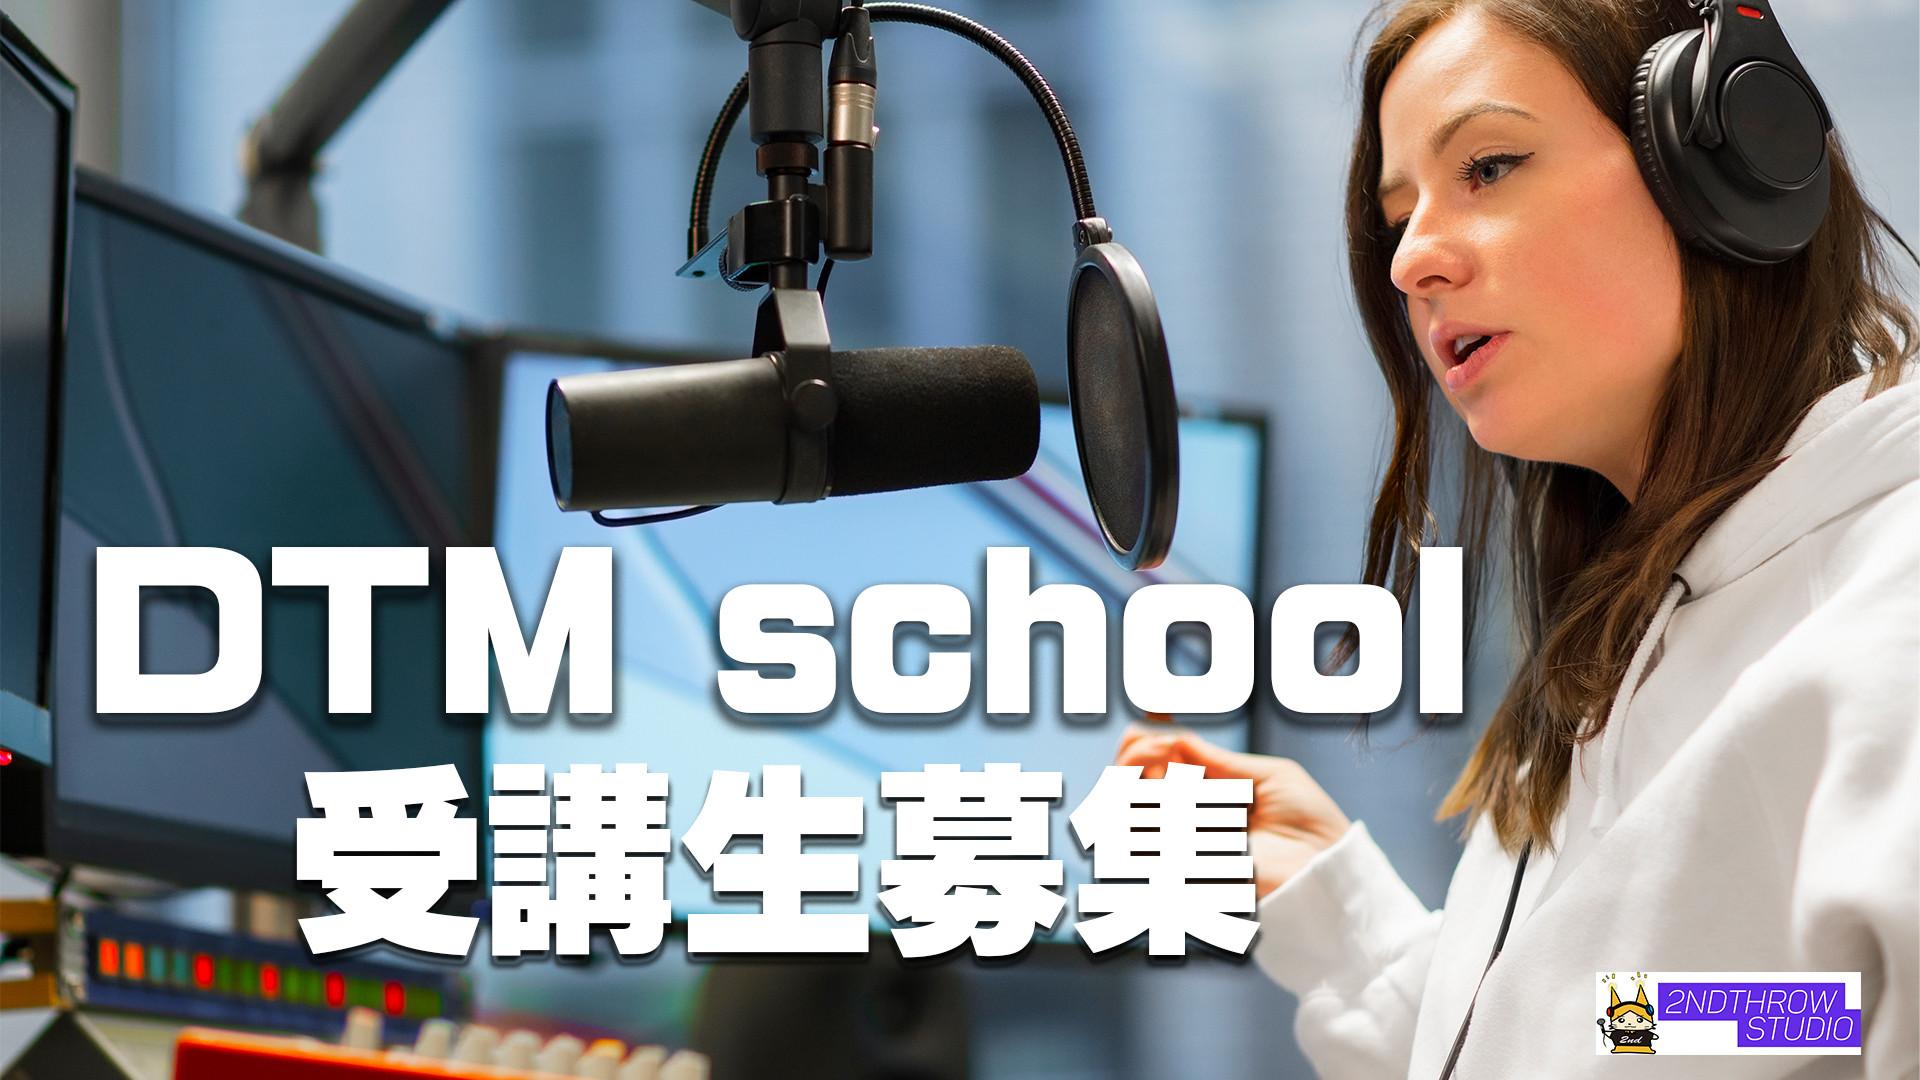 DTM school.jpg